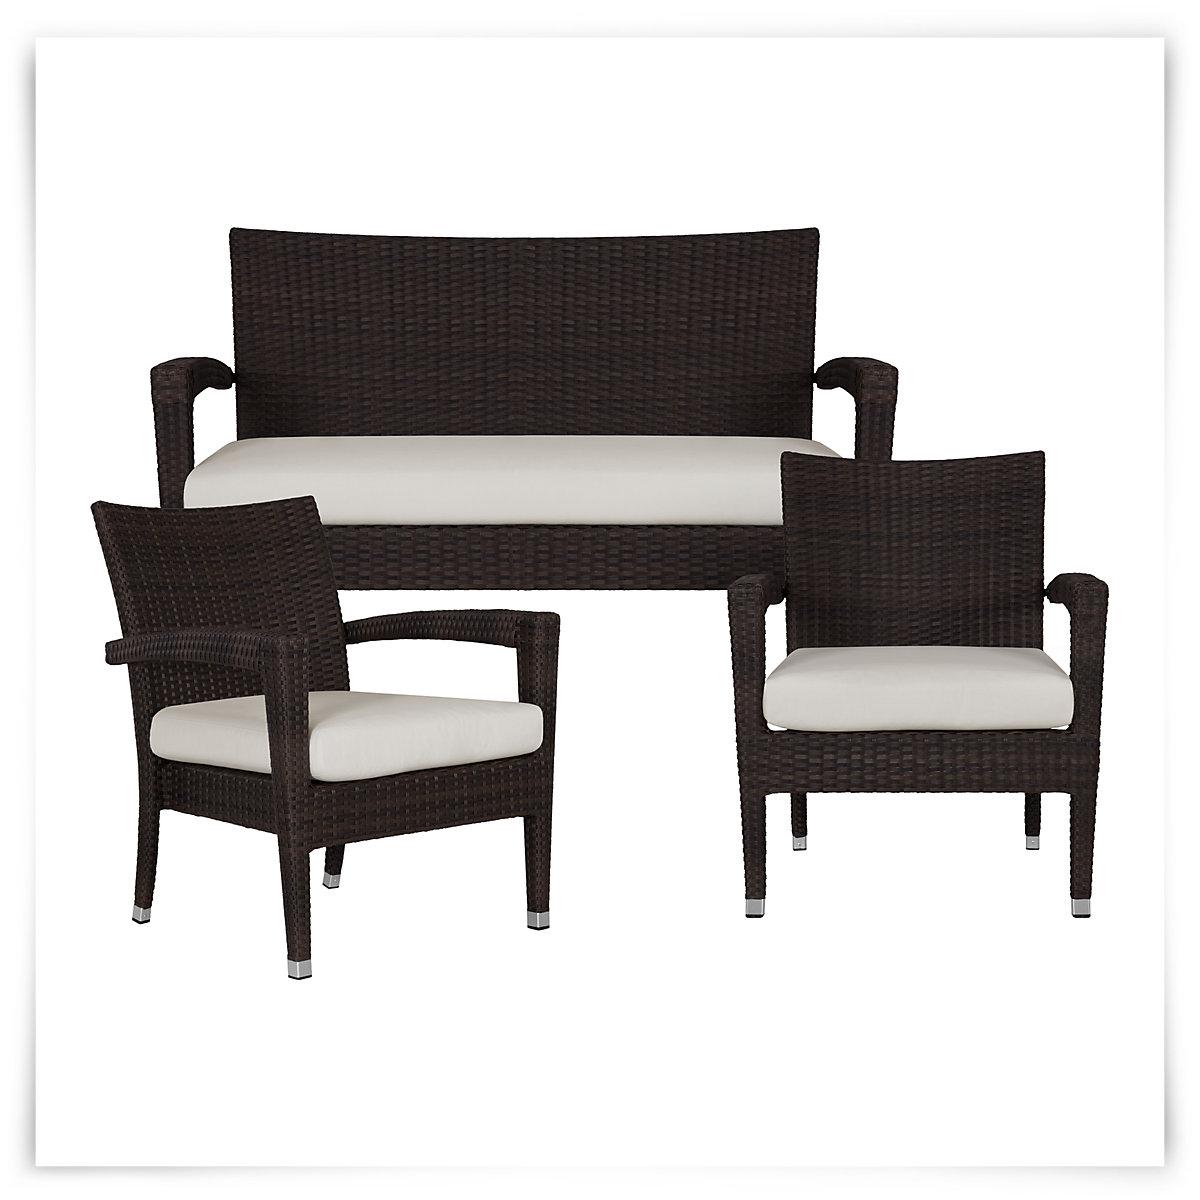 City Furniture Zen White Outdoor Living Room Set